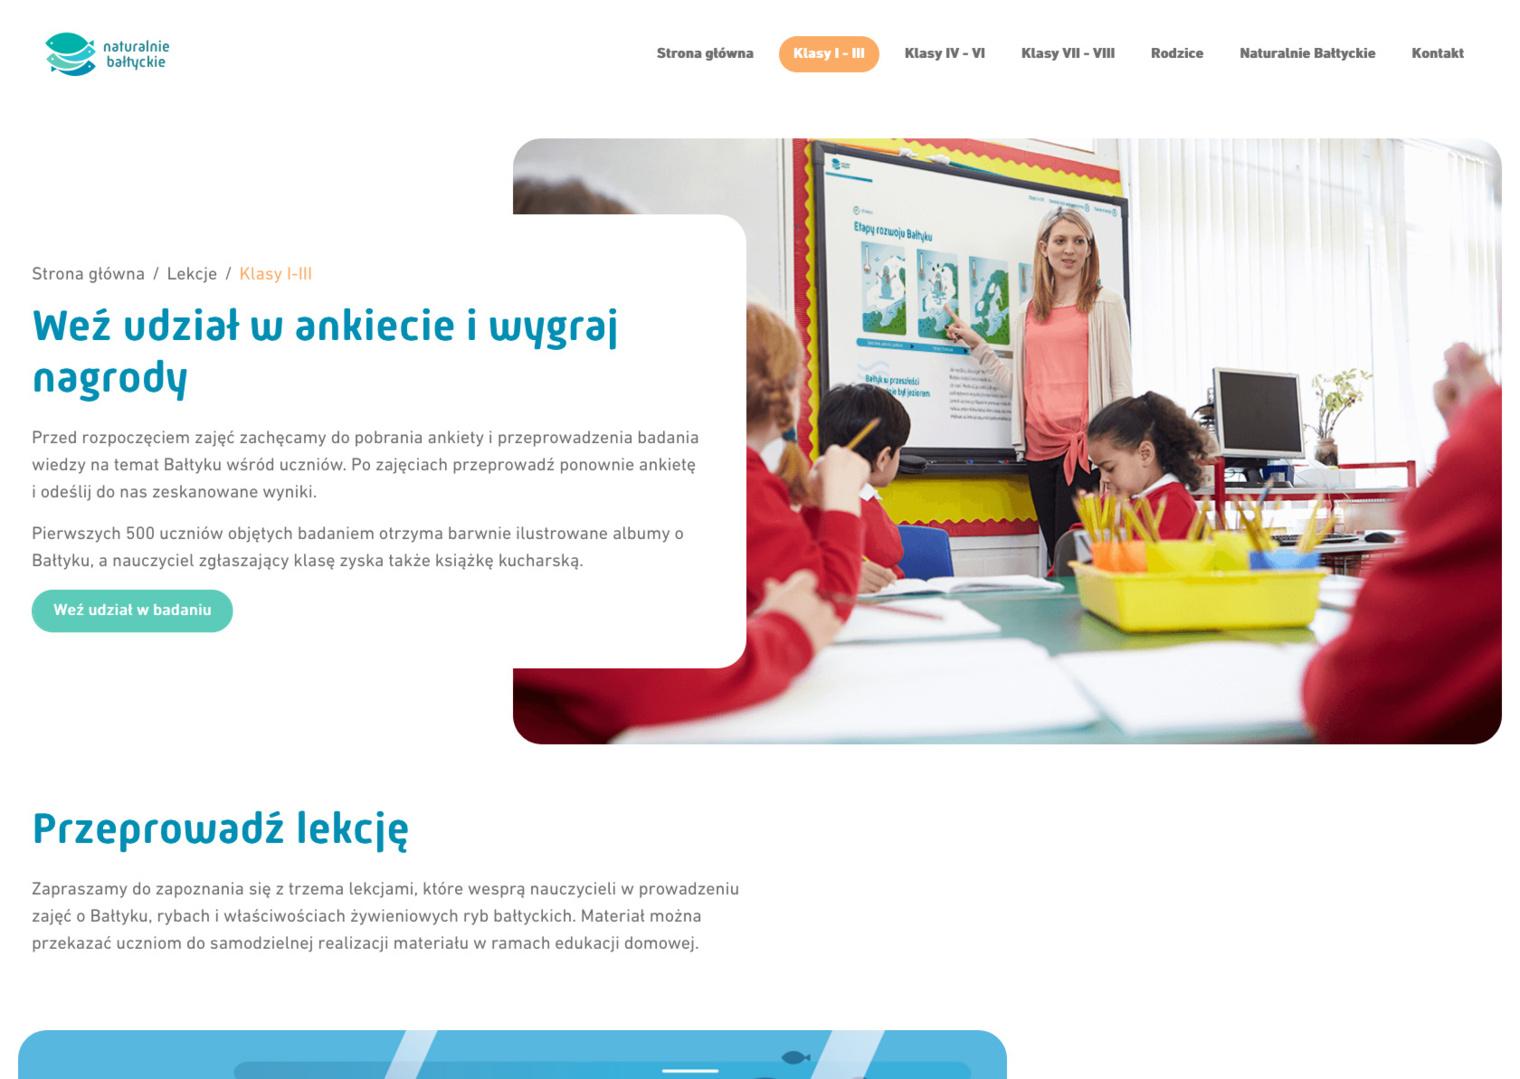 Zrzut ekranu z komputera